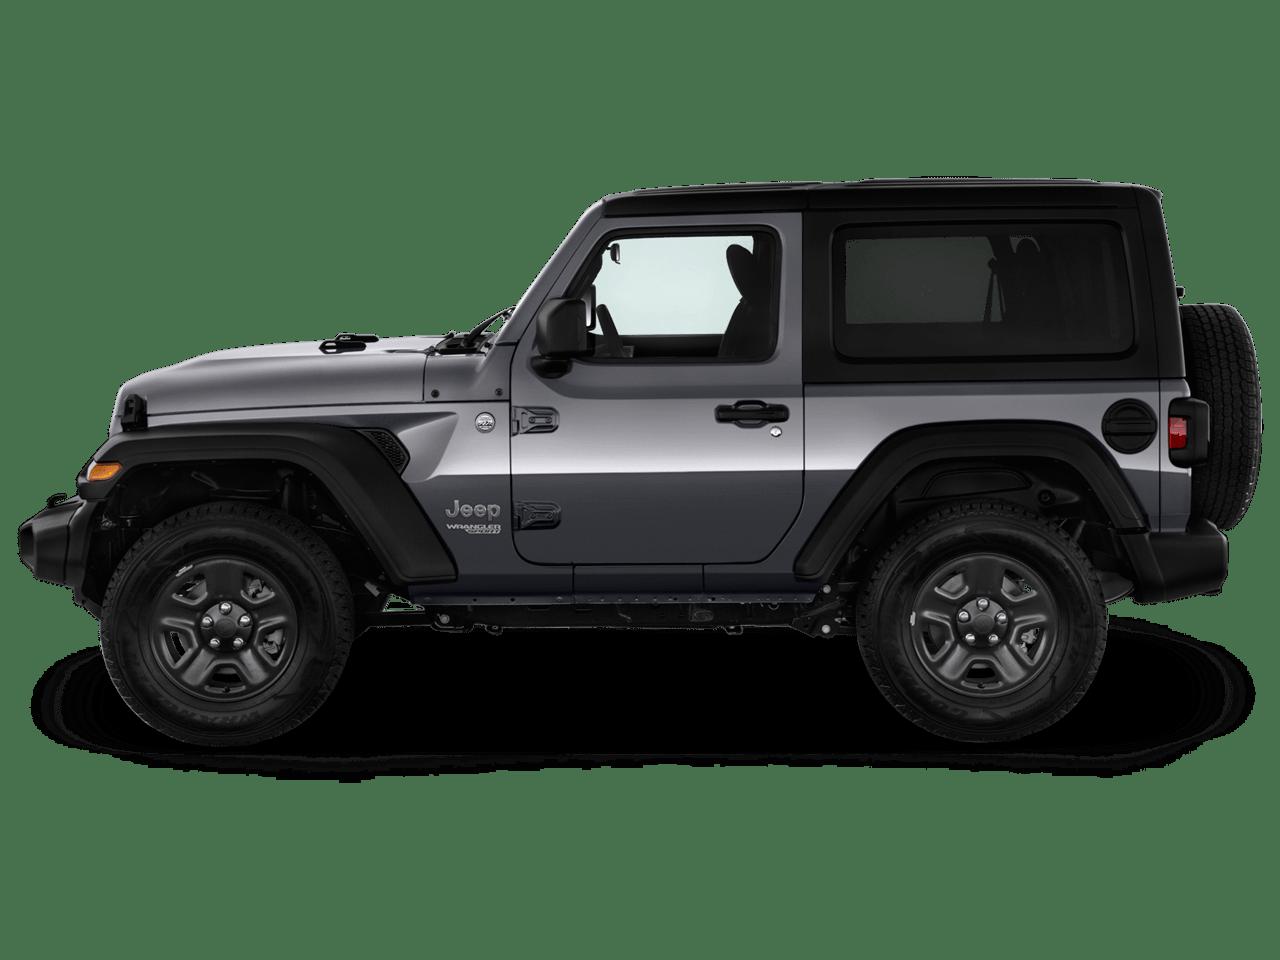 hight resolution of 2019 jeep wrangler leasing near fort lee nj chrysler dodge jeep ram of englewood cliffs